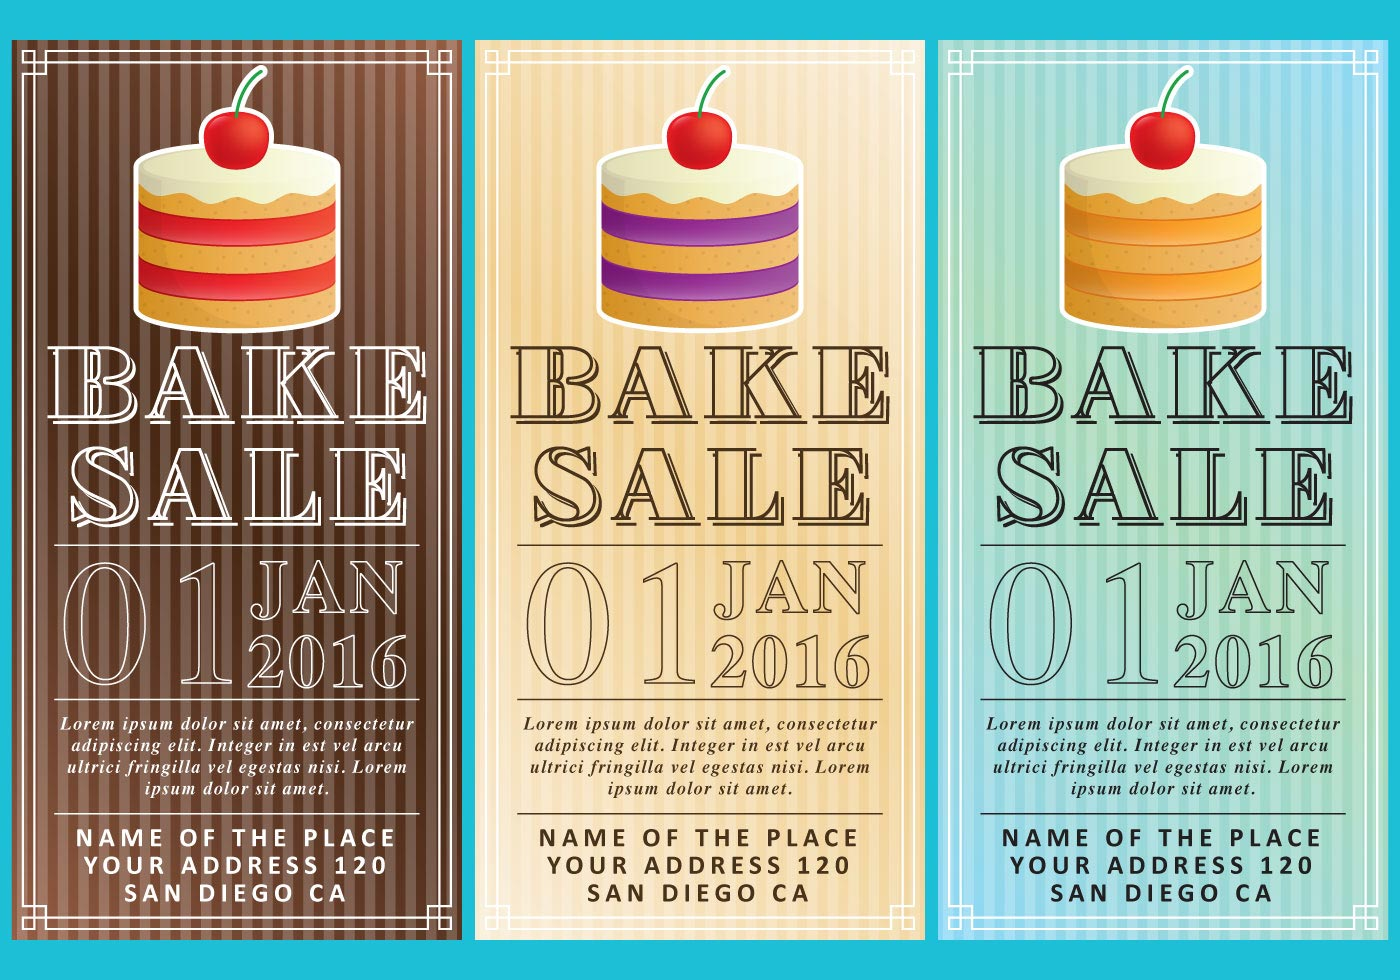 Bake Sale Flyers Download Free Vector Art Stock